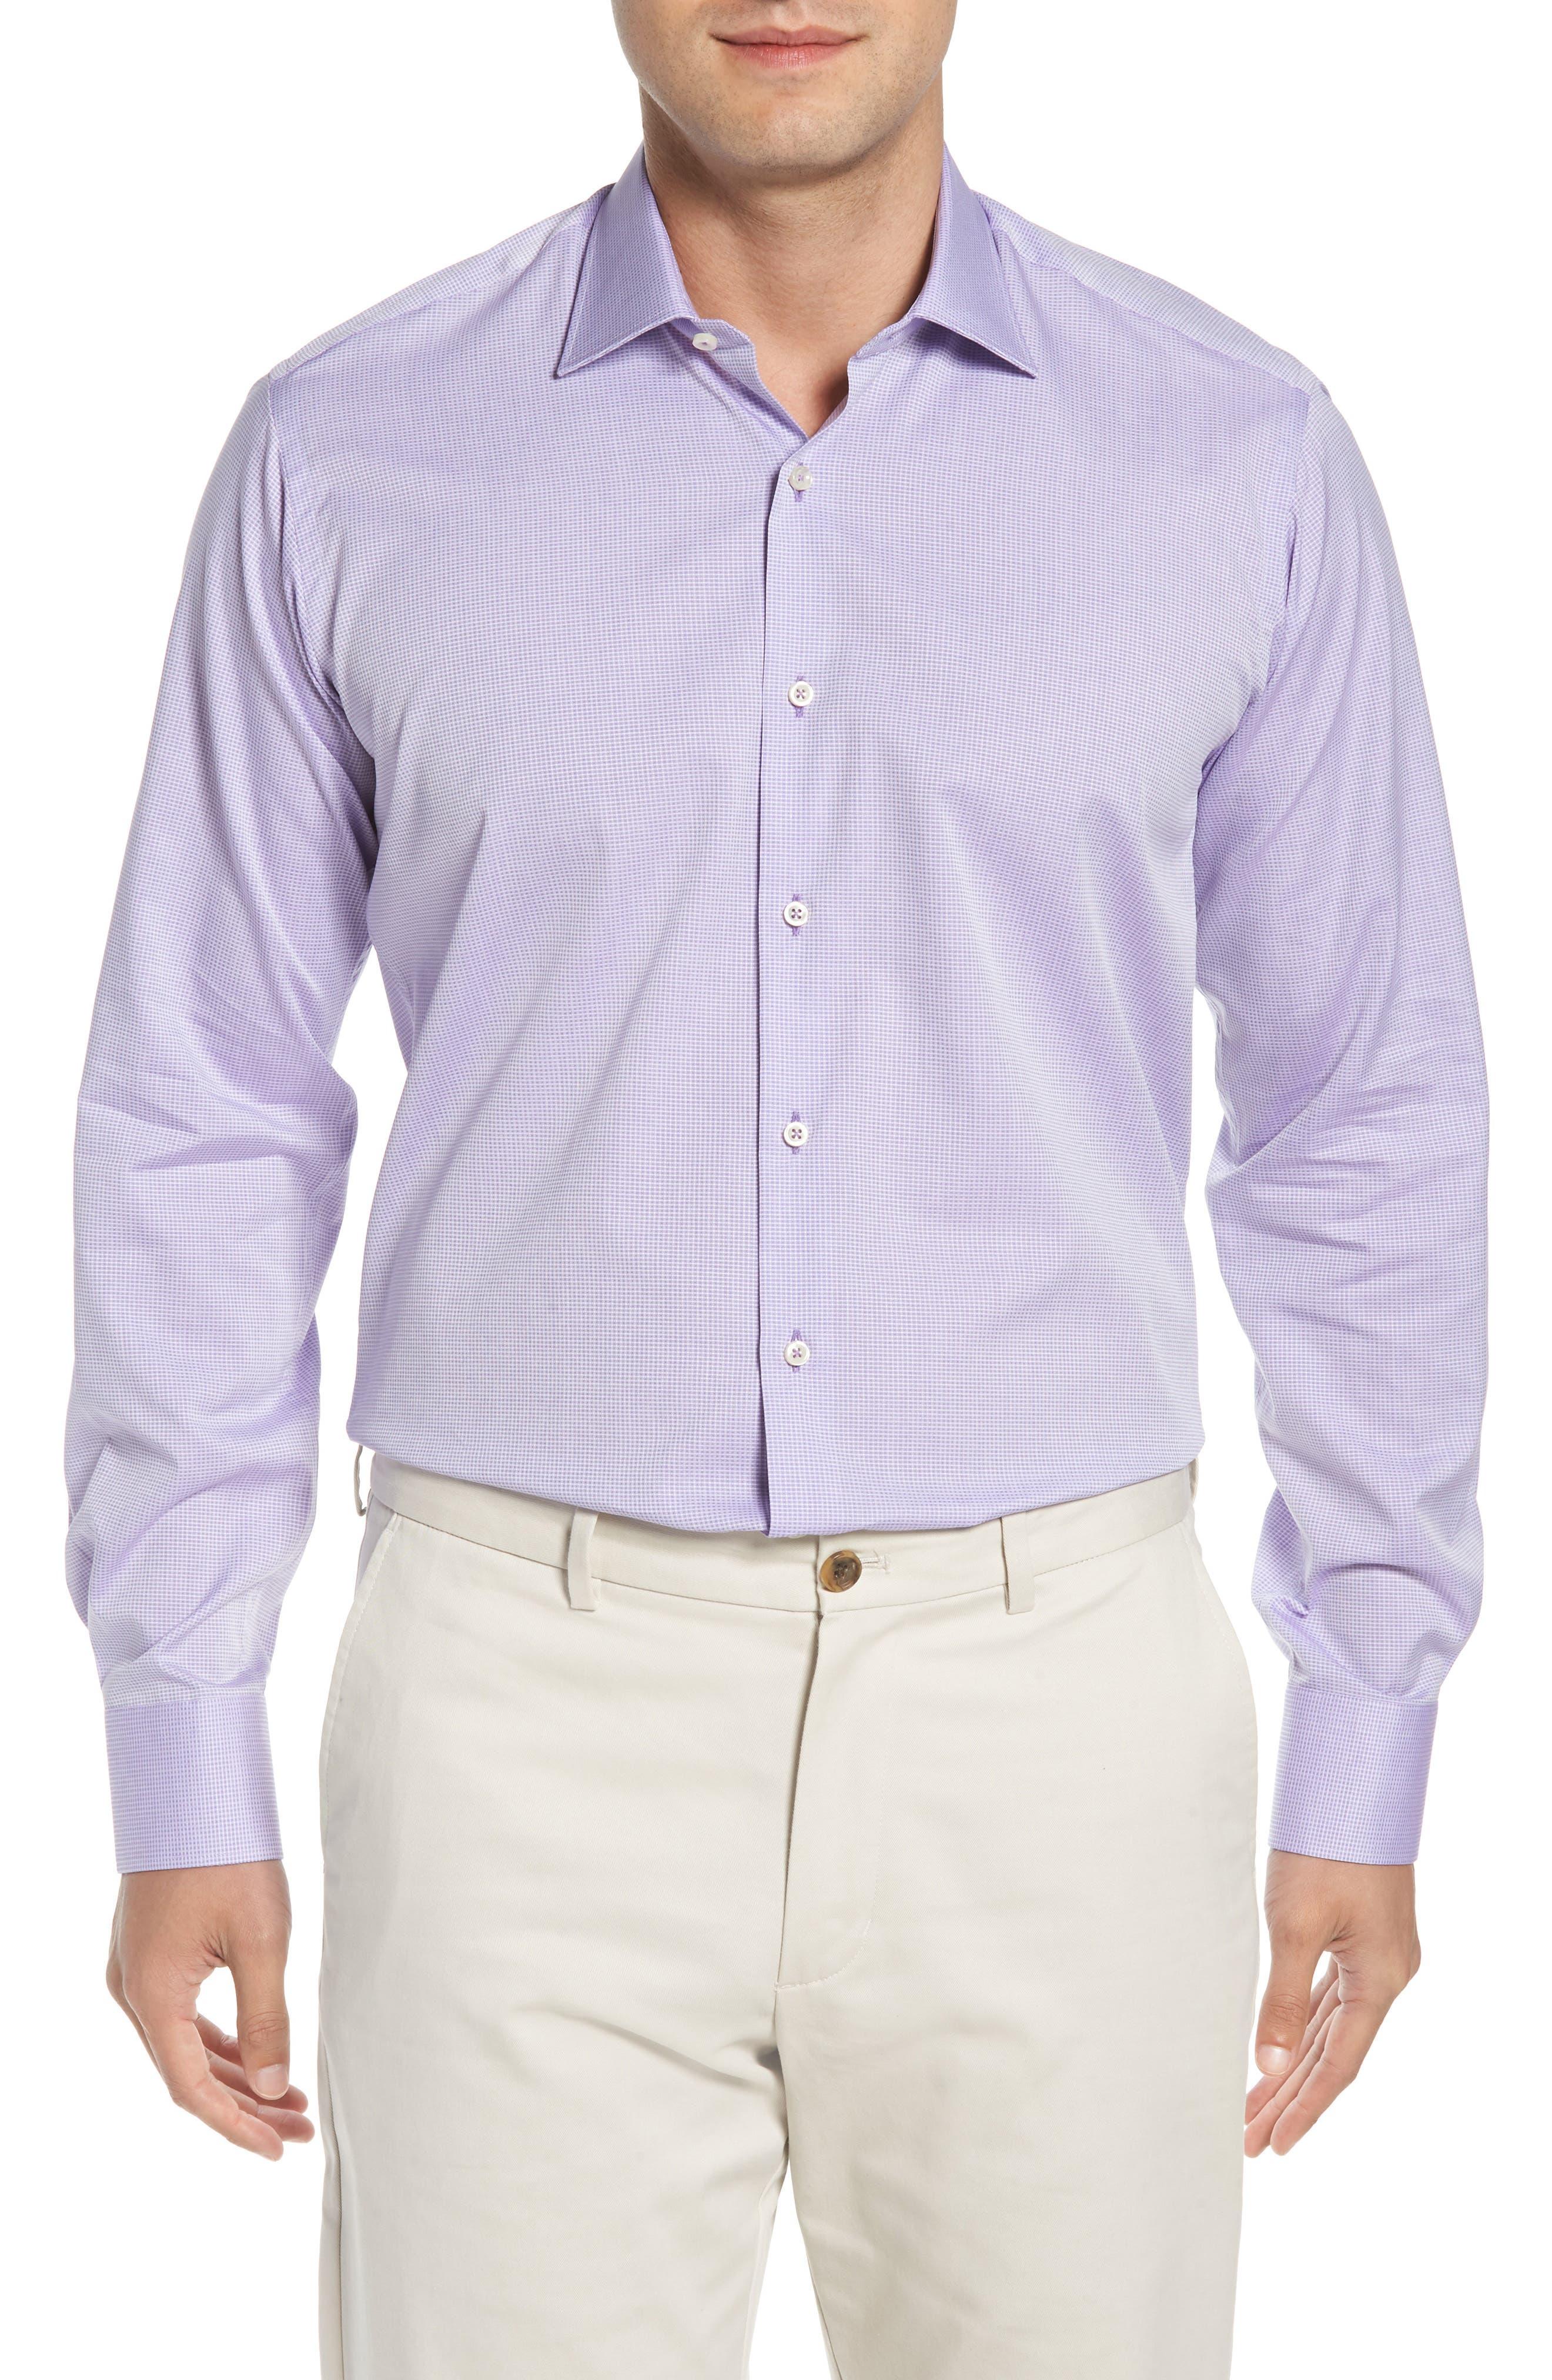 Regular Fit Solid Dress Shirt,                         Main,                         color, 500